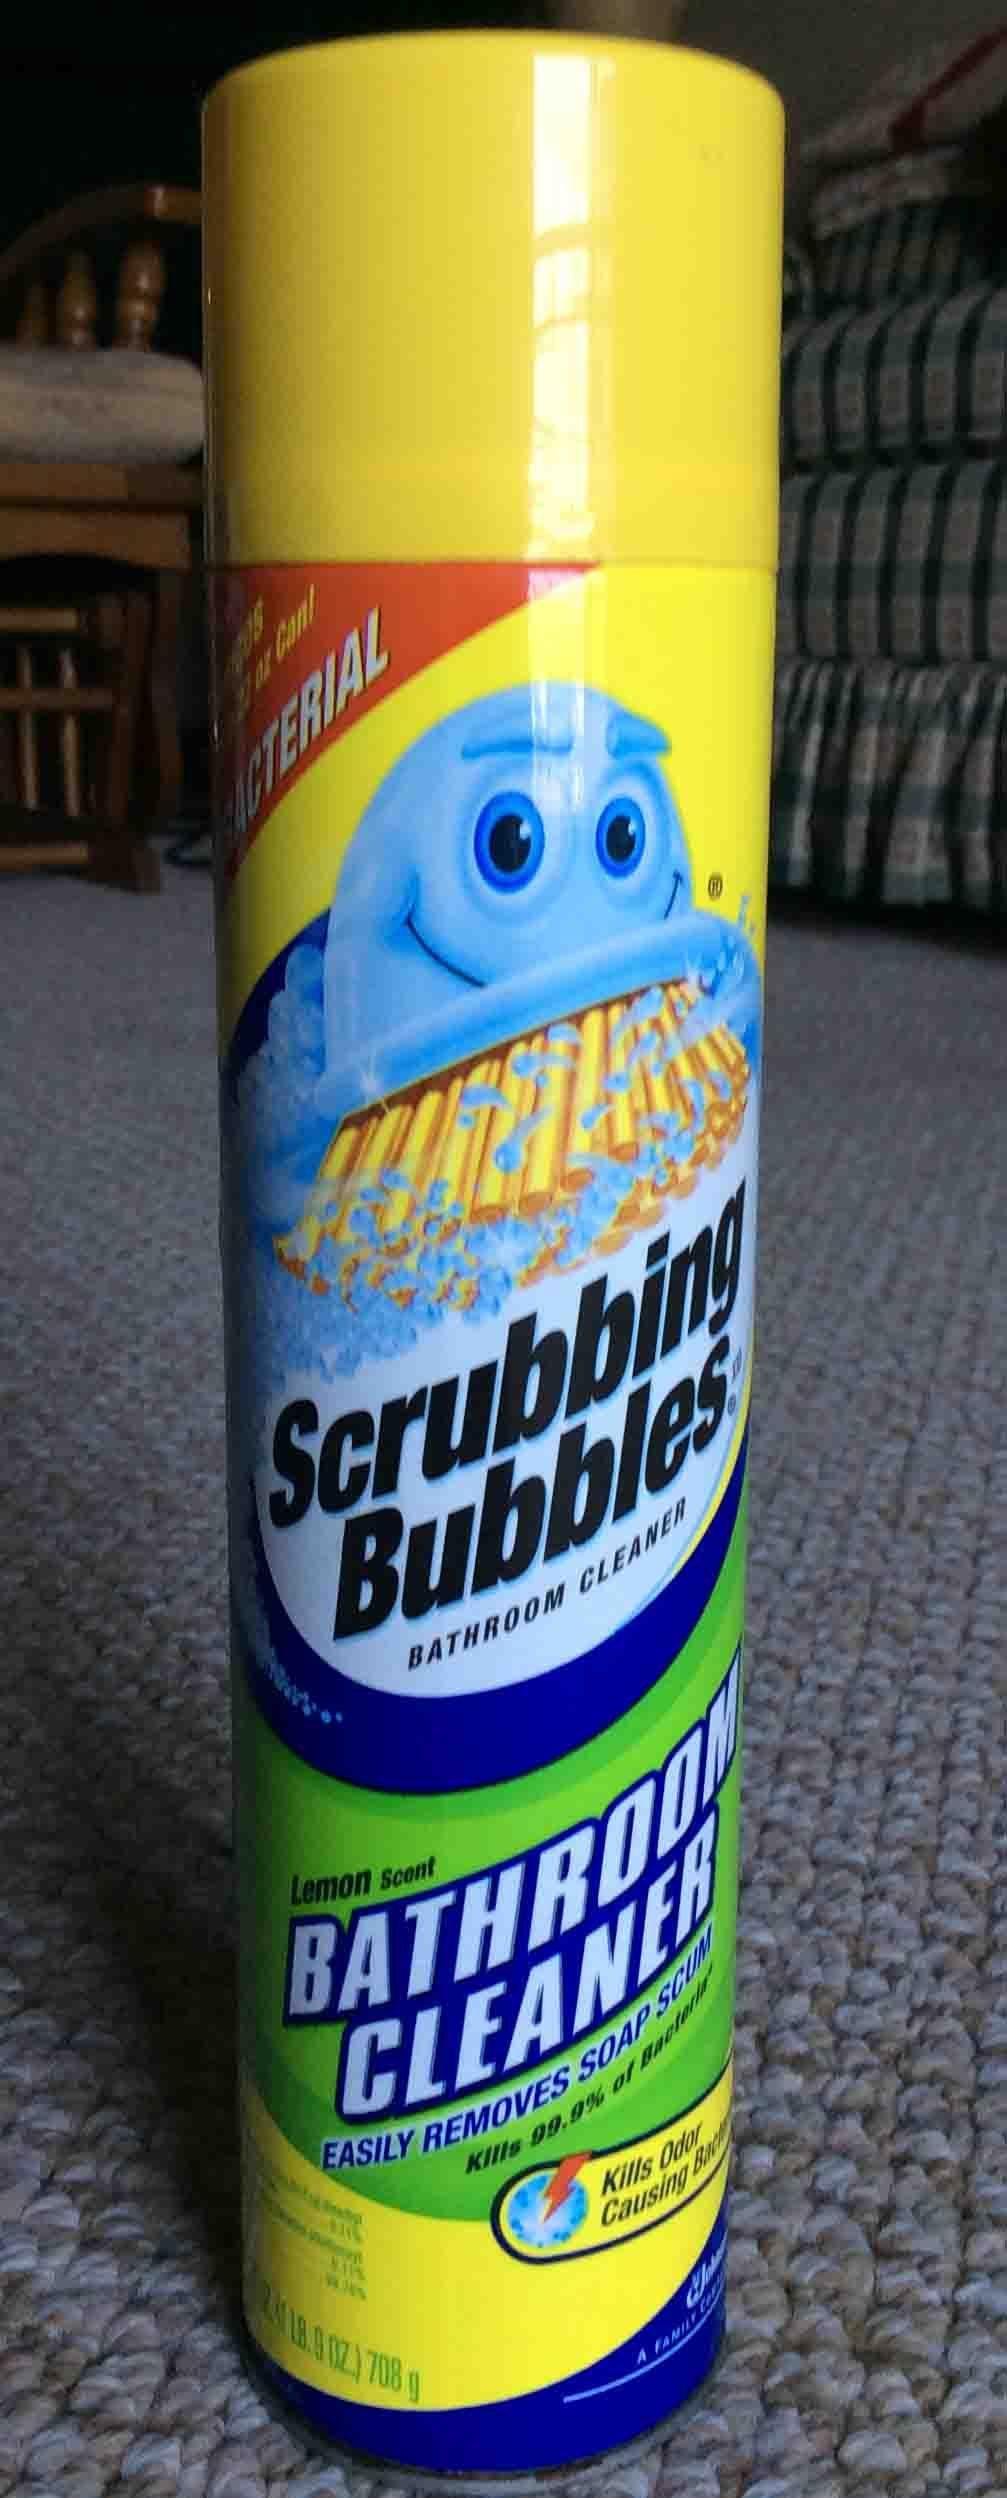 Scrubbing Bubbles Bathroom Cleaner Reviews In Bathroom